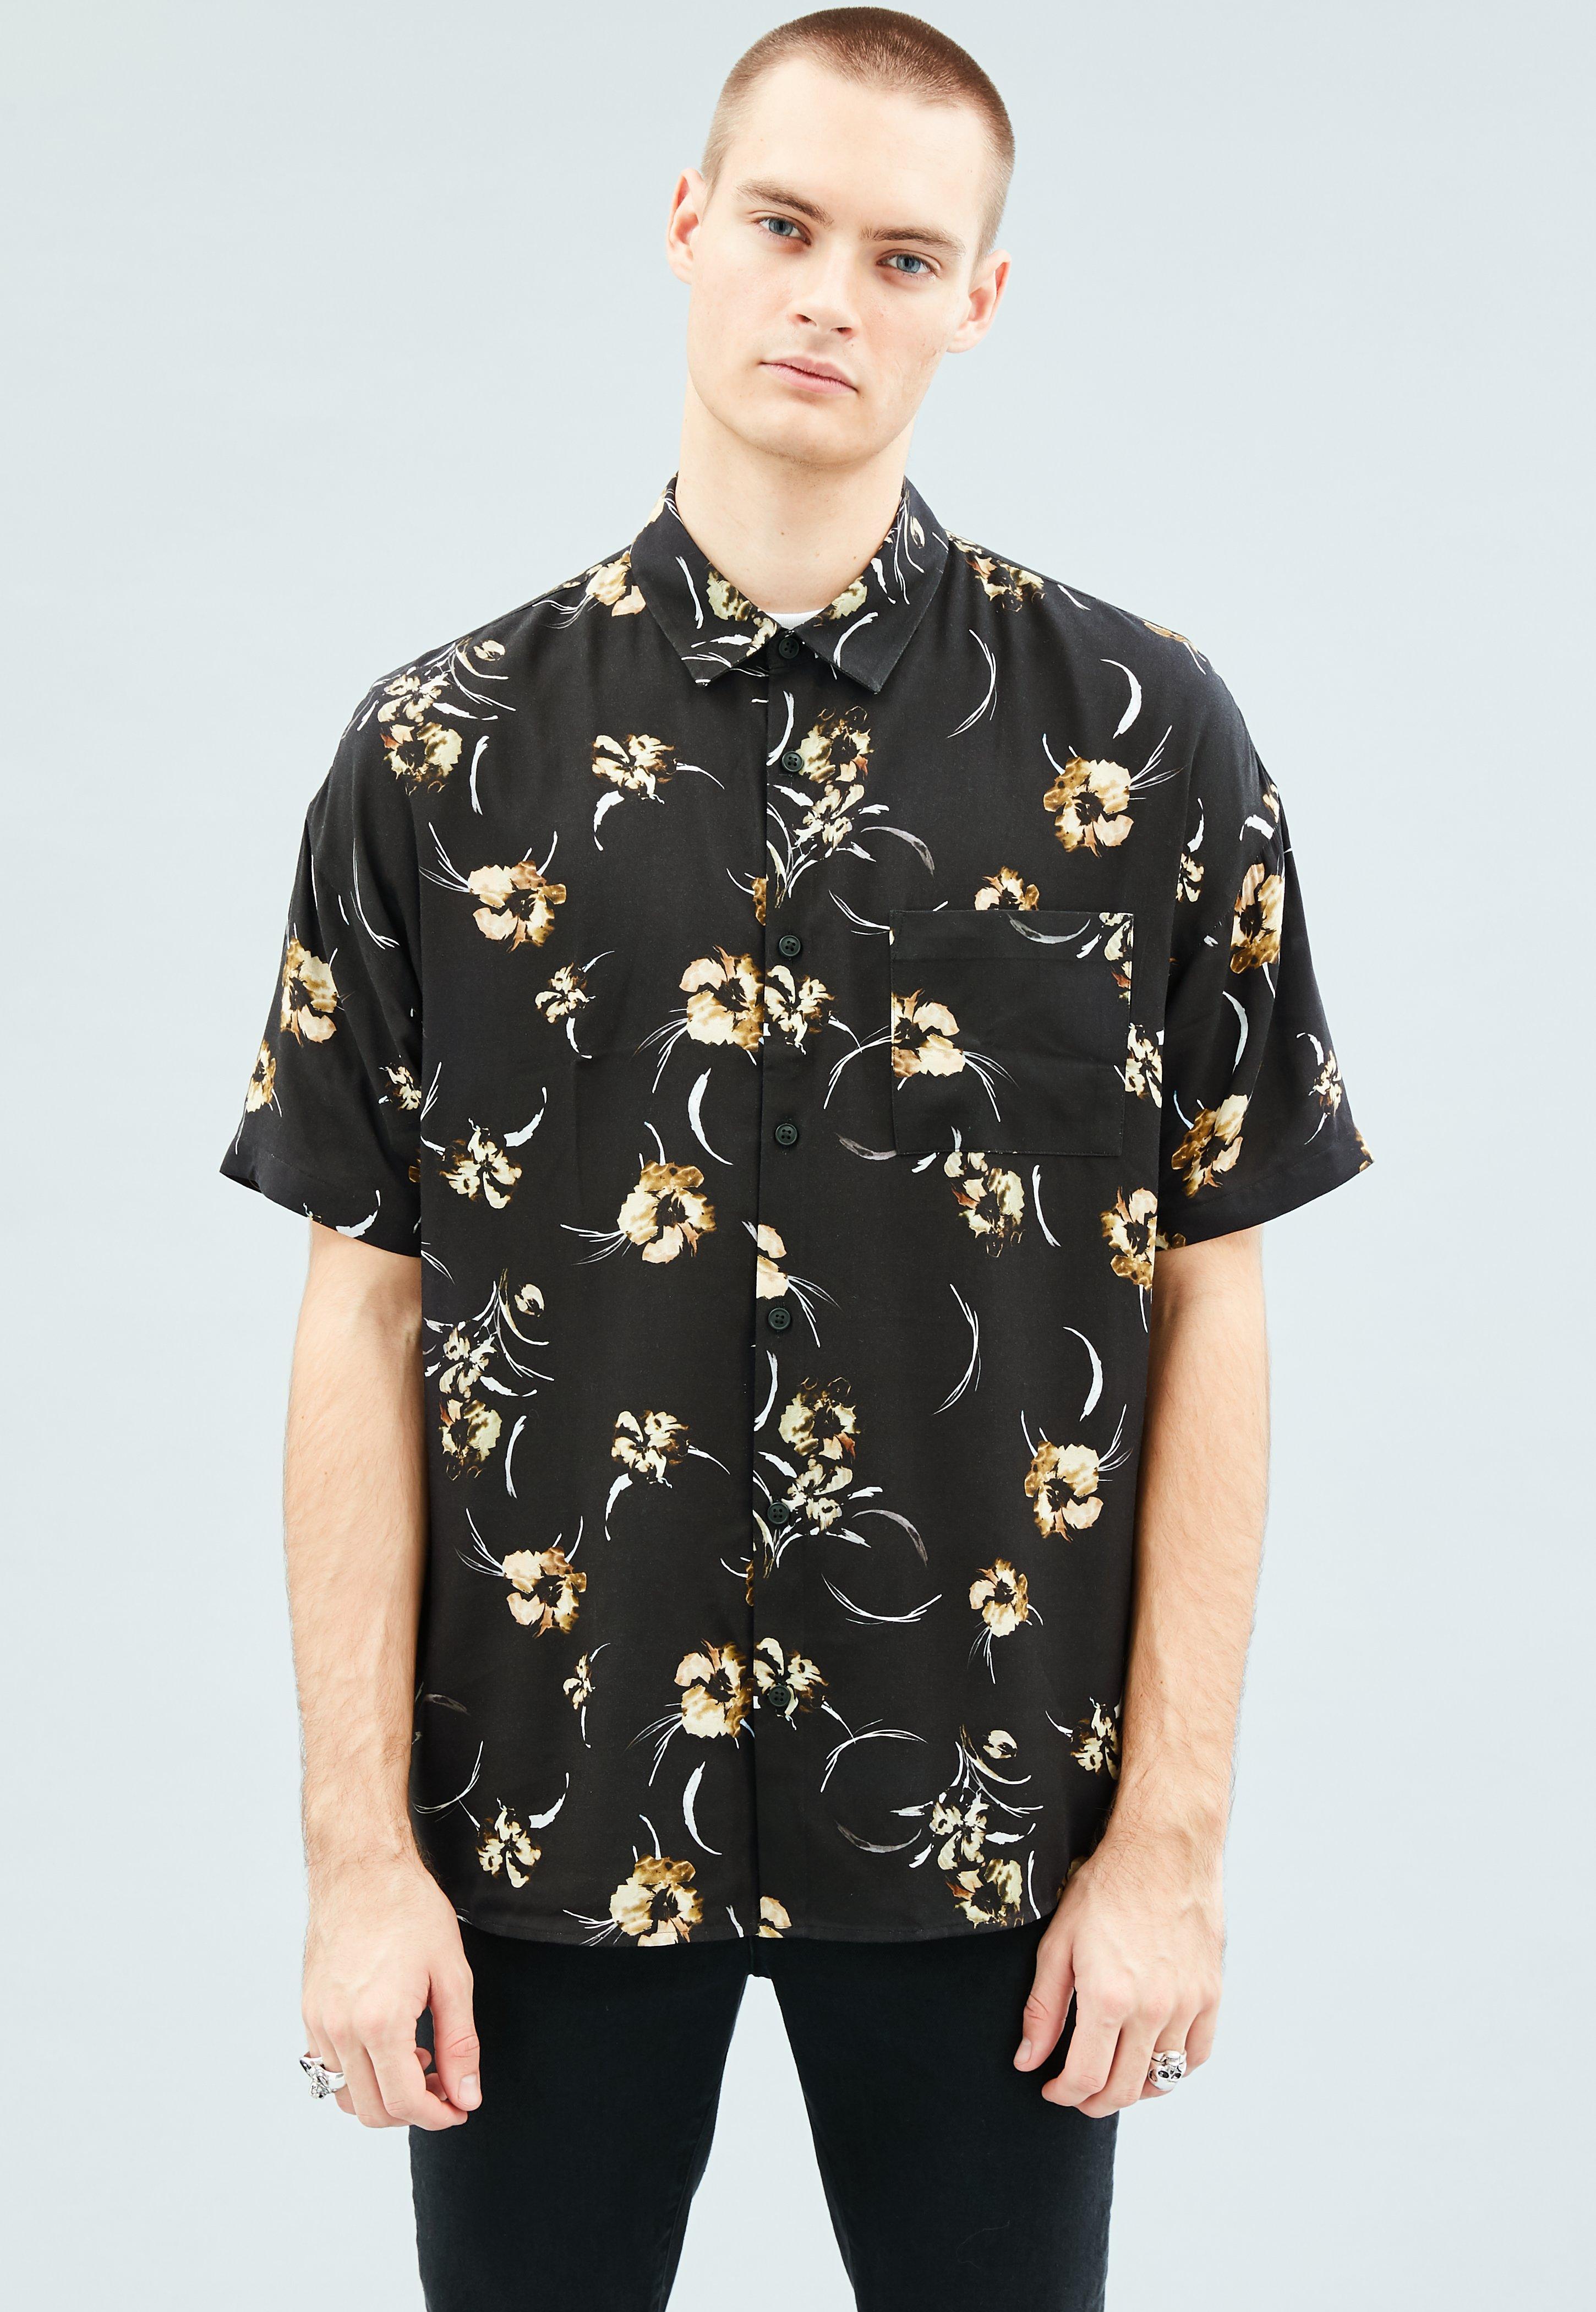 ddd9698bfb Men s Shirts